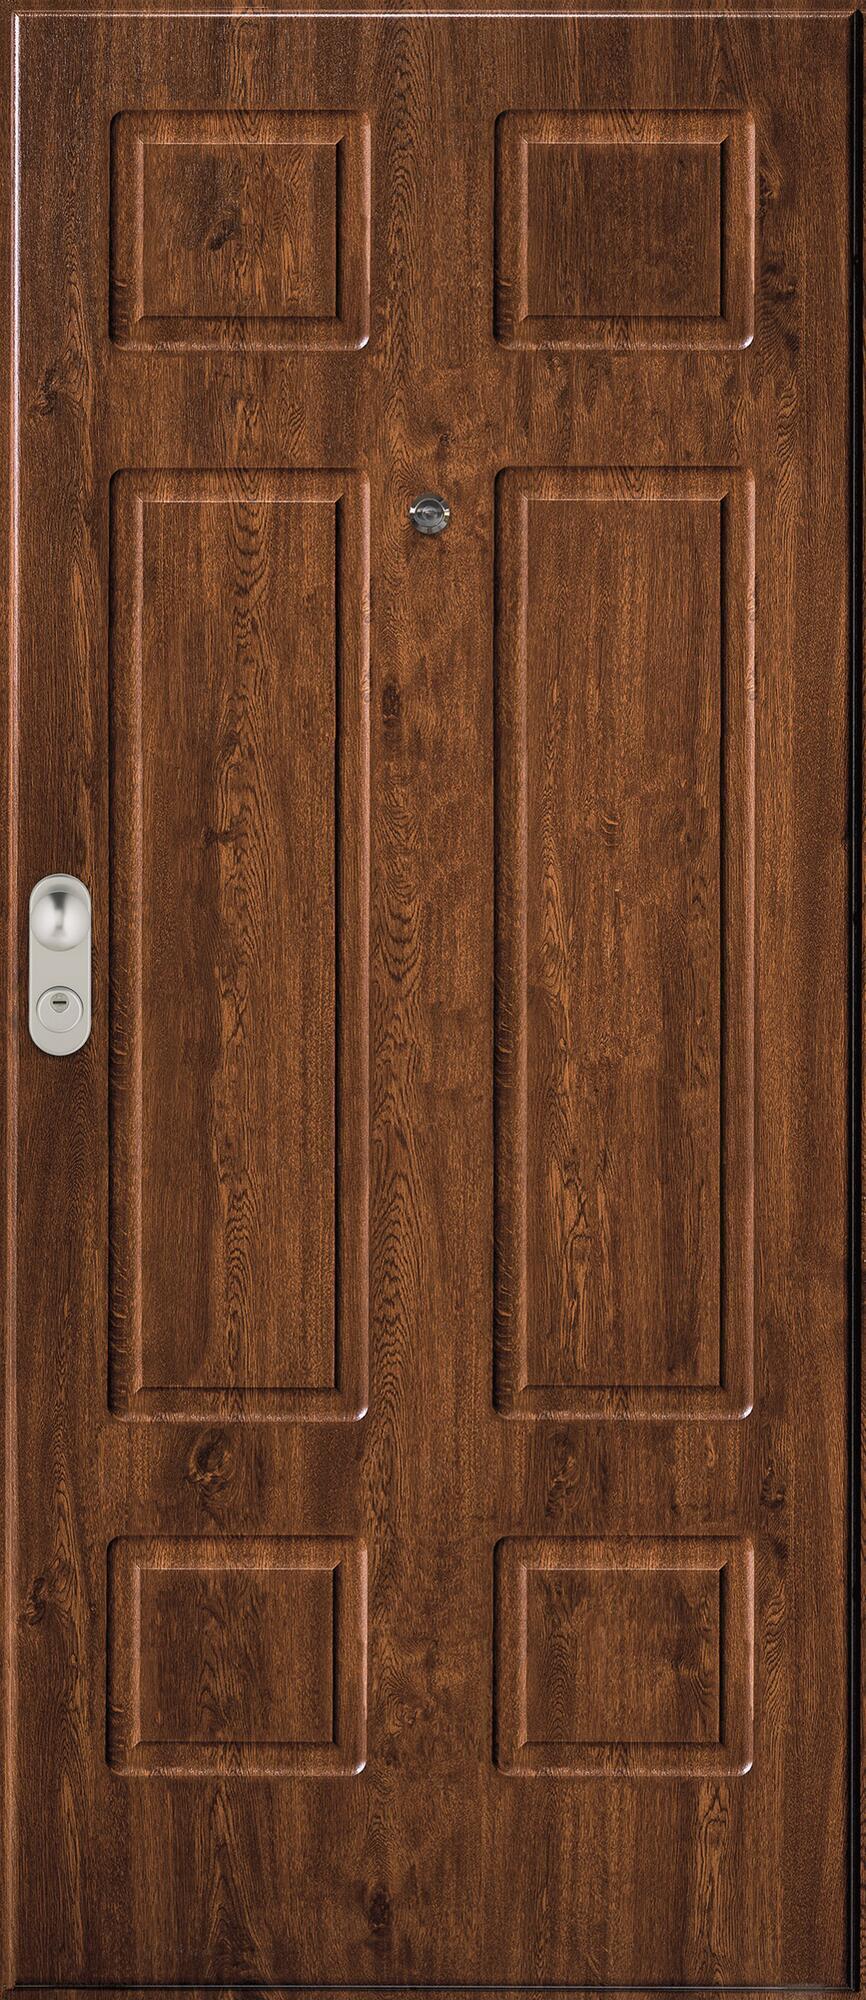 Porta blindata Iro noce L 90 x H 210 cm destra - 2